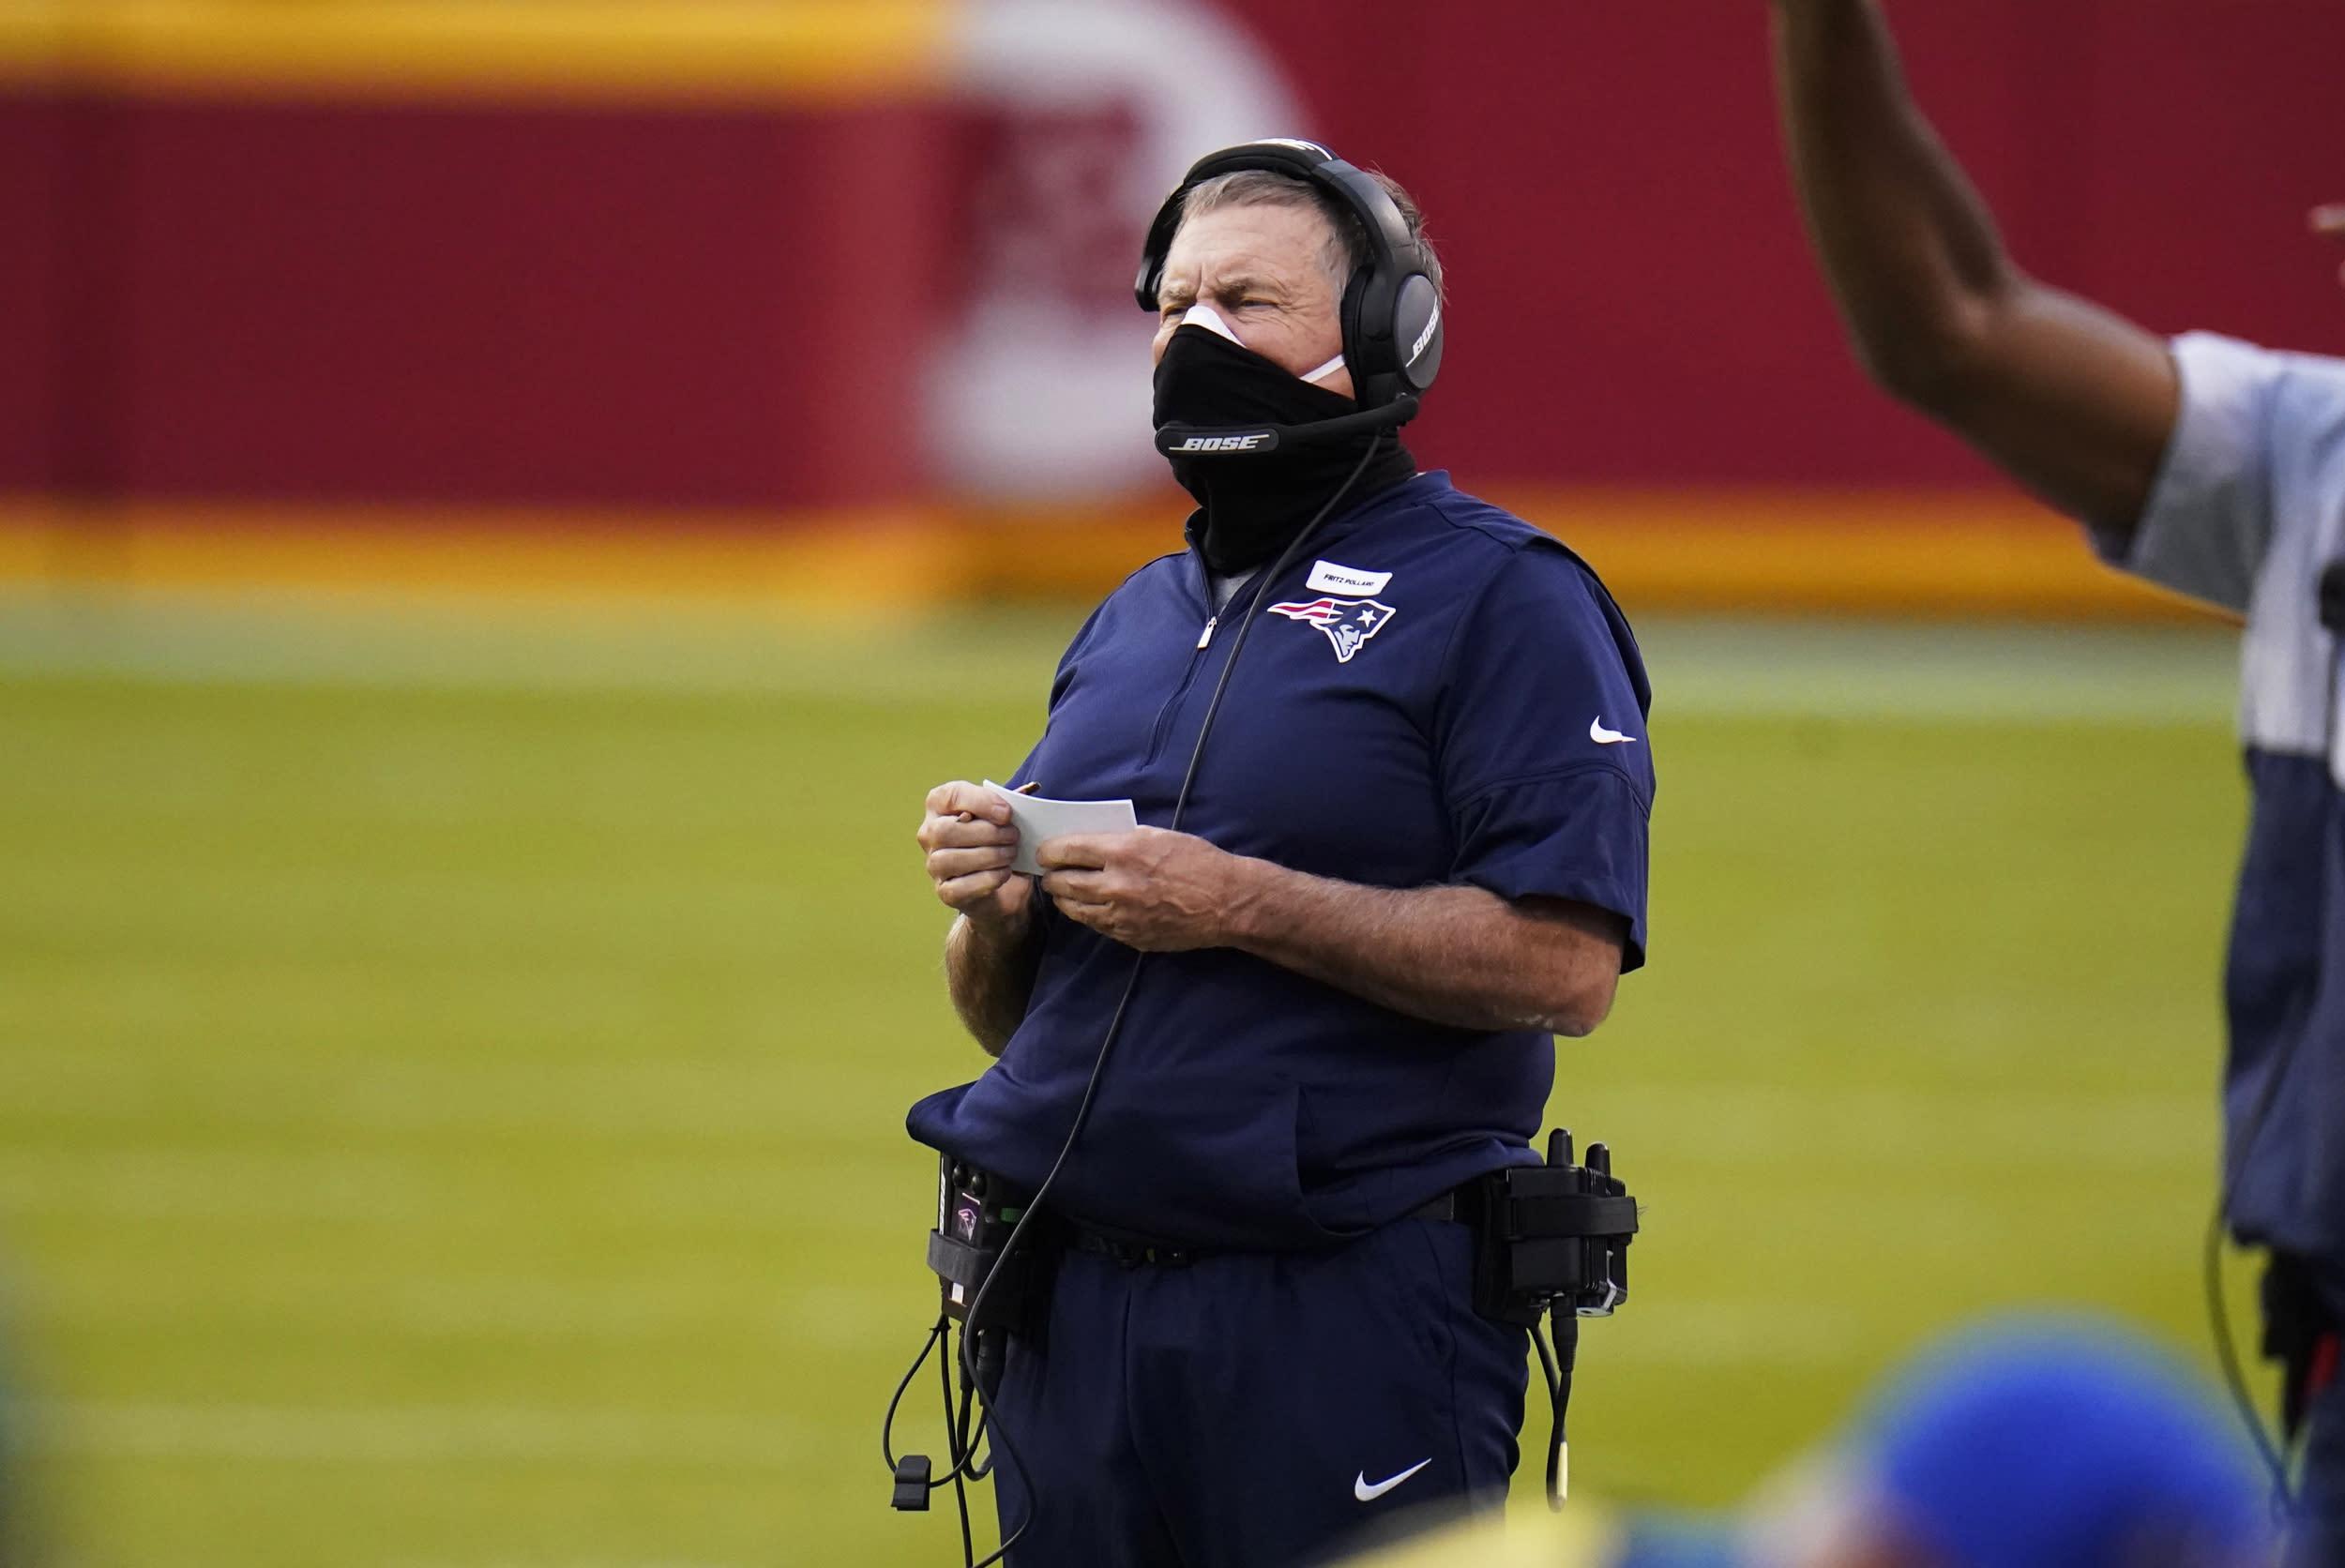 NFL's Covid-19 woes continue: Patriots-Broncos again postponed; Titans' facility again shut down